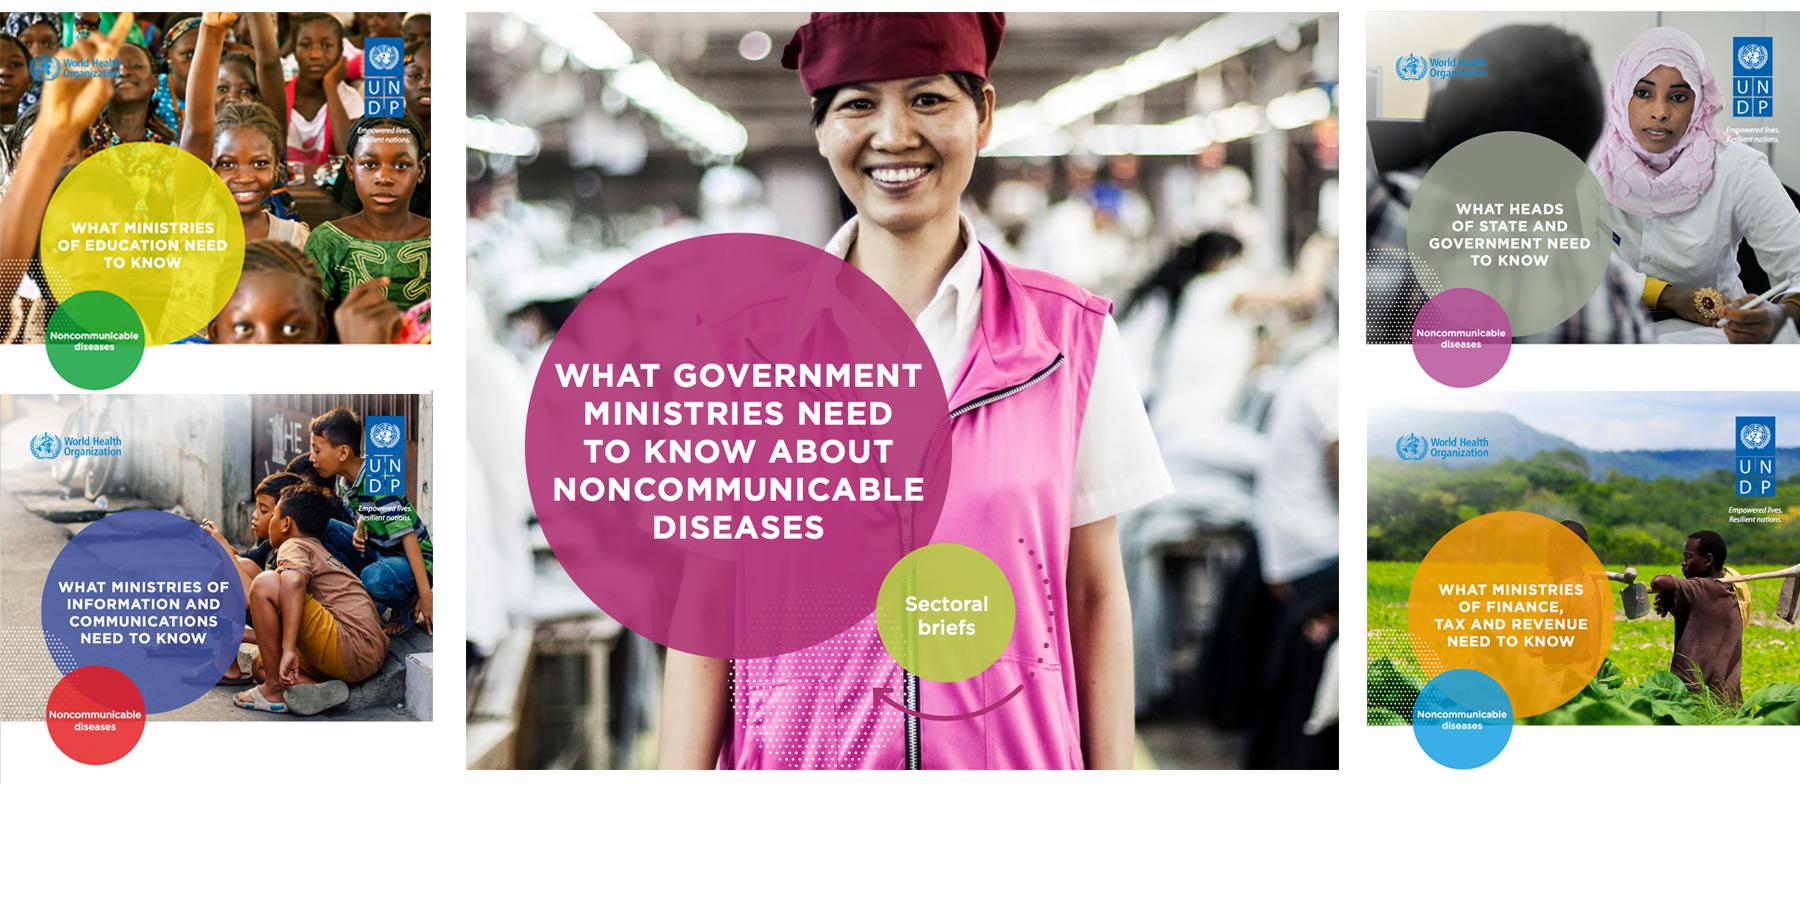 WHO UNDP-Sectoral-Briefs-Blog-Header.png